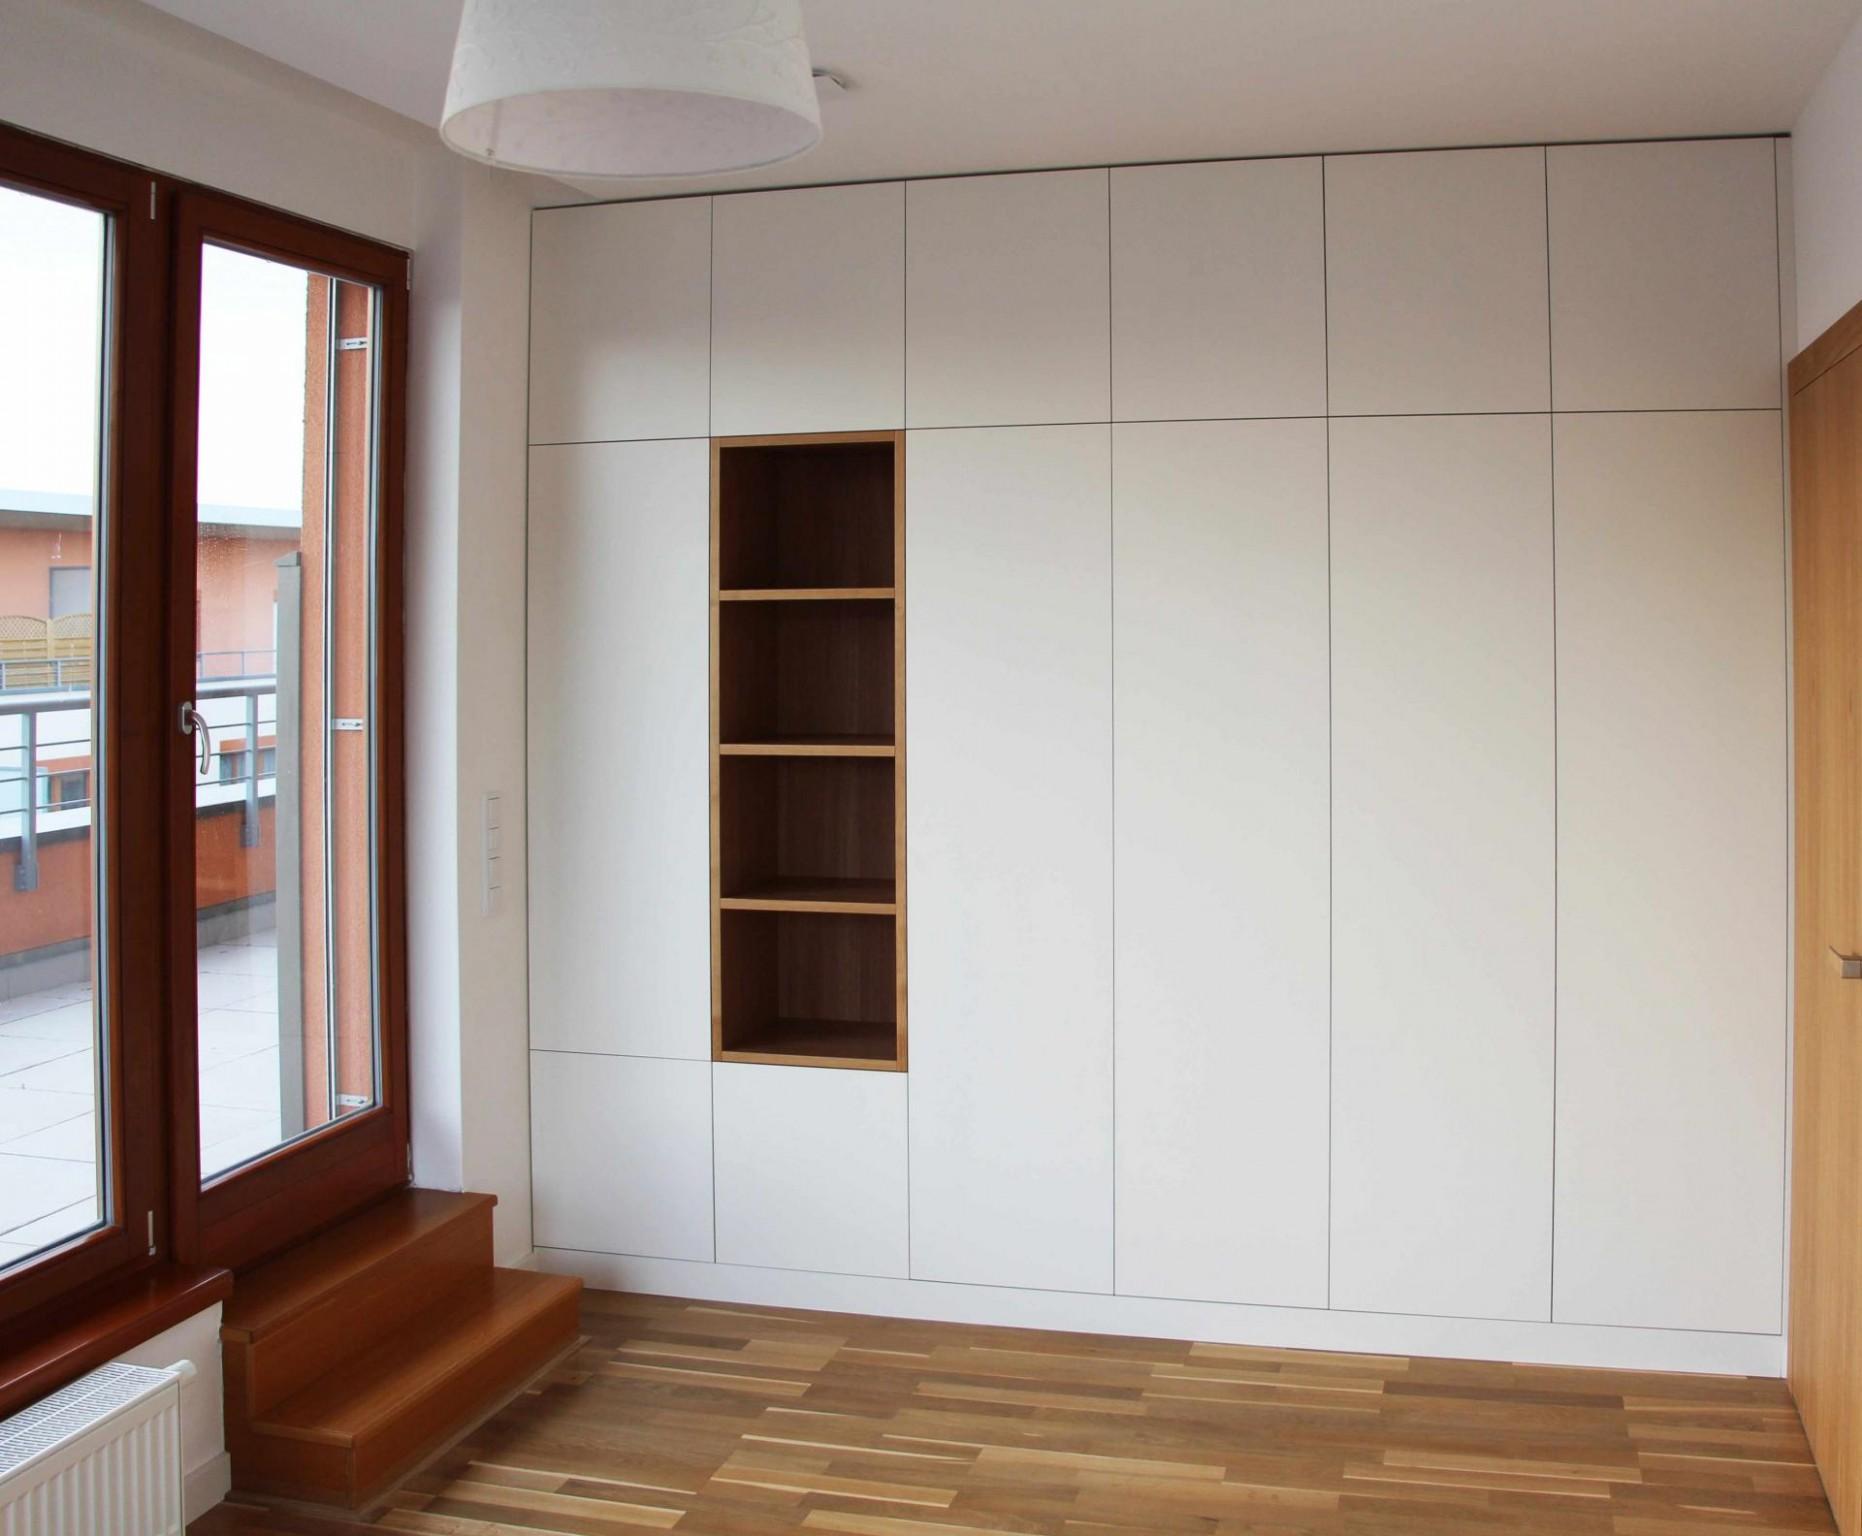 Ložnice, skříně, postele | ABAT interiér